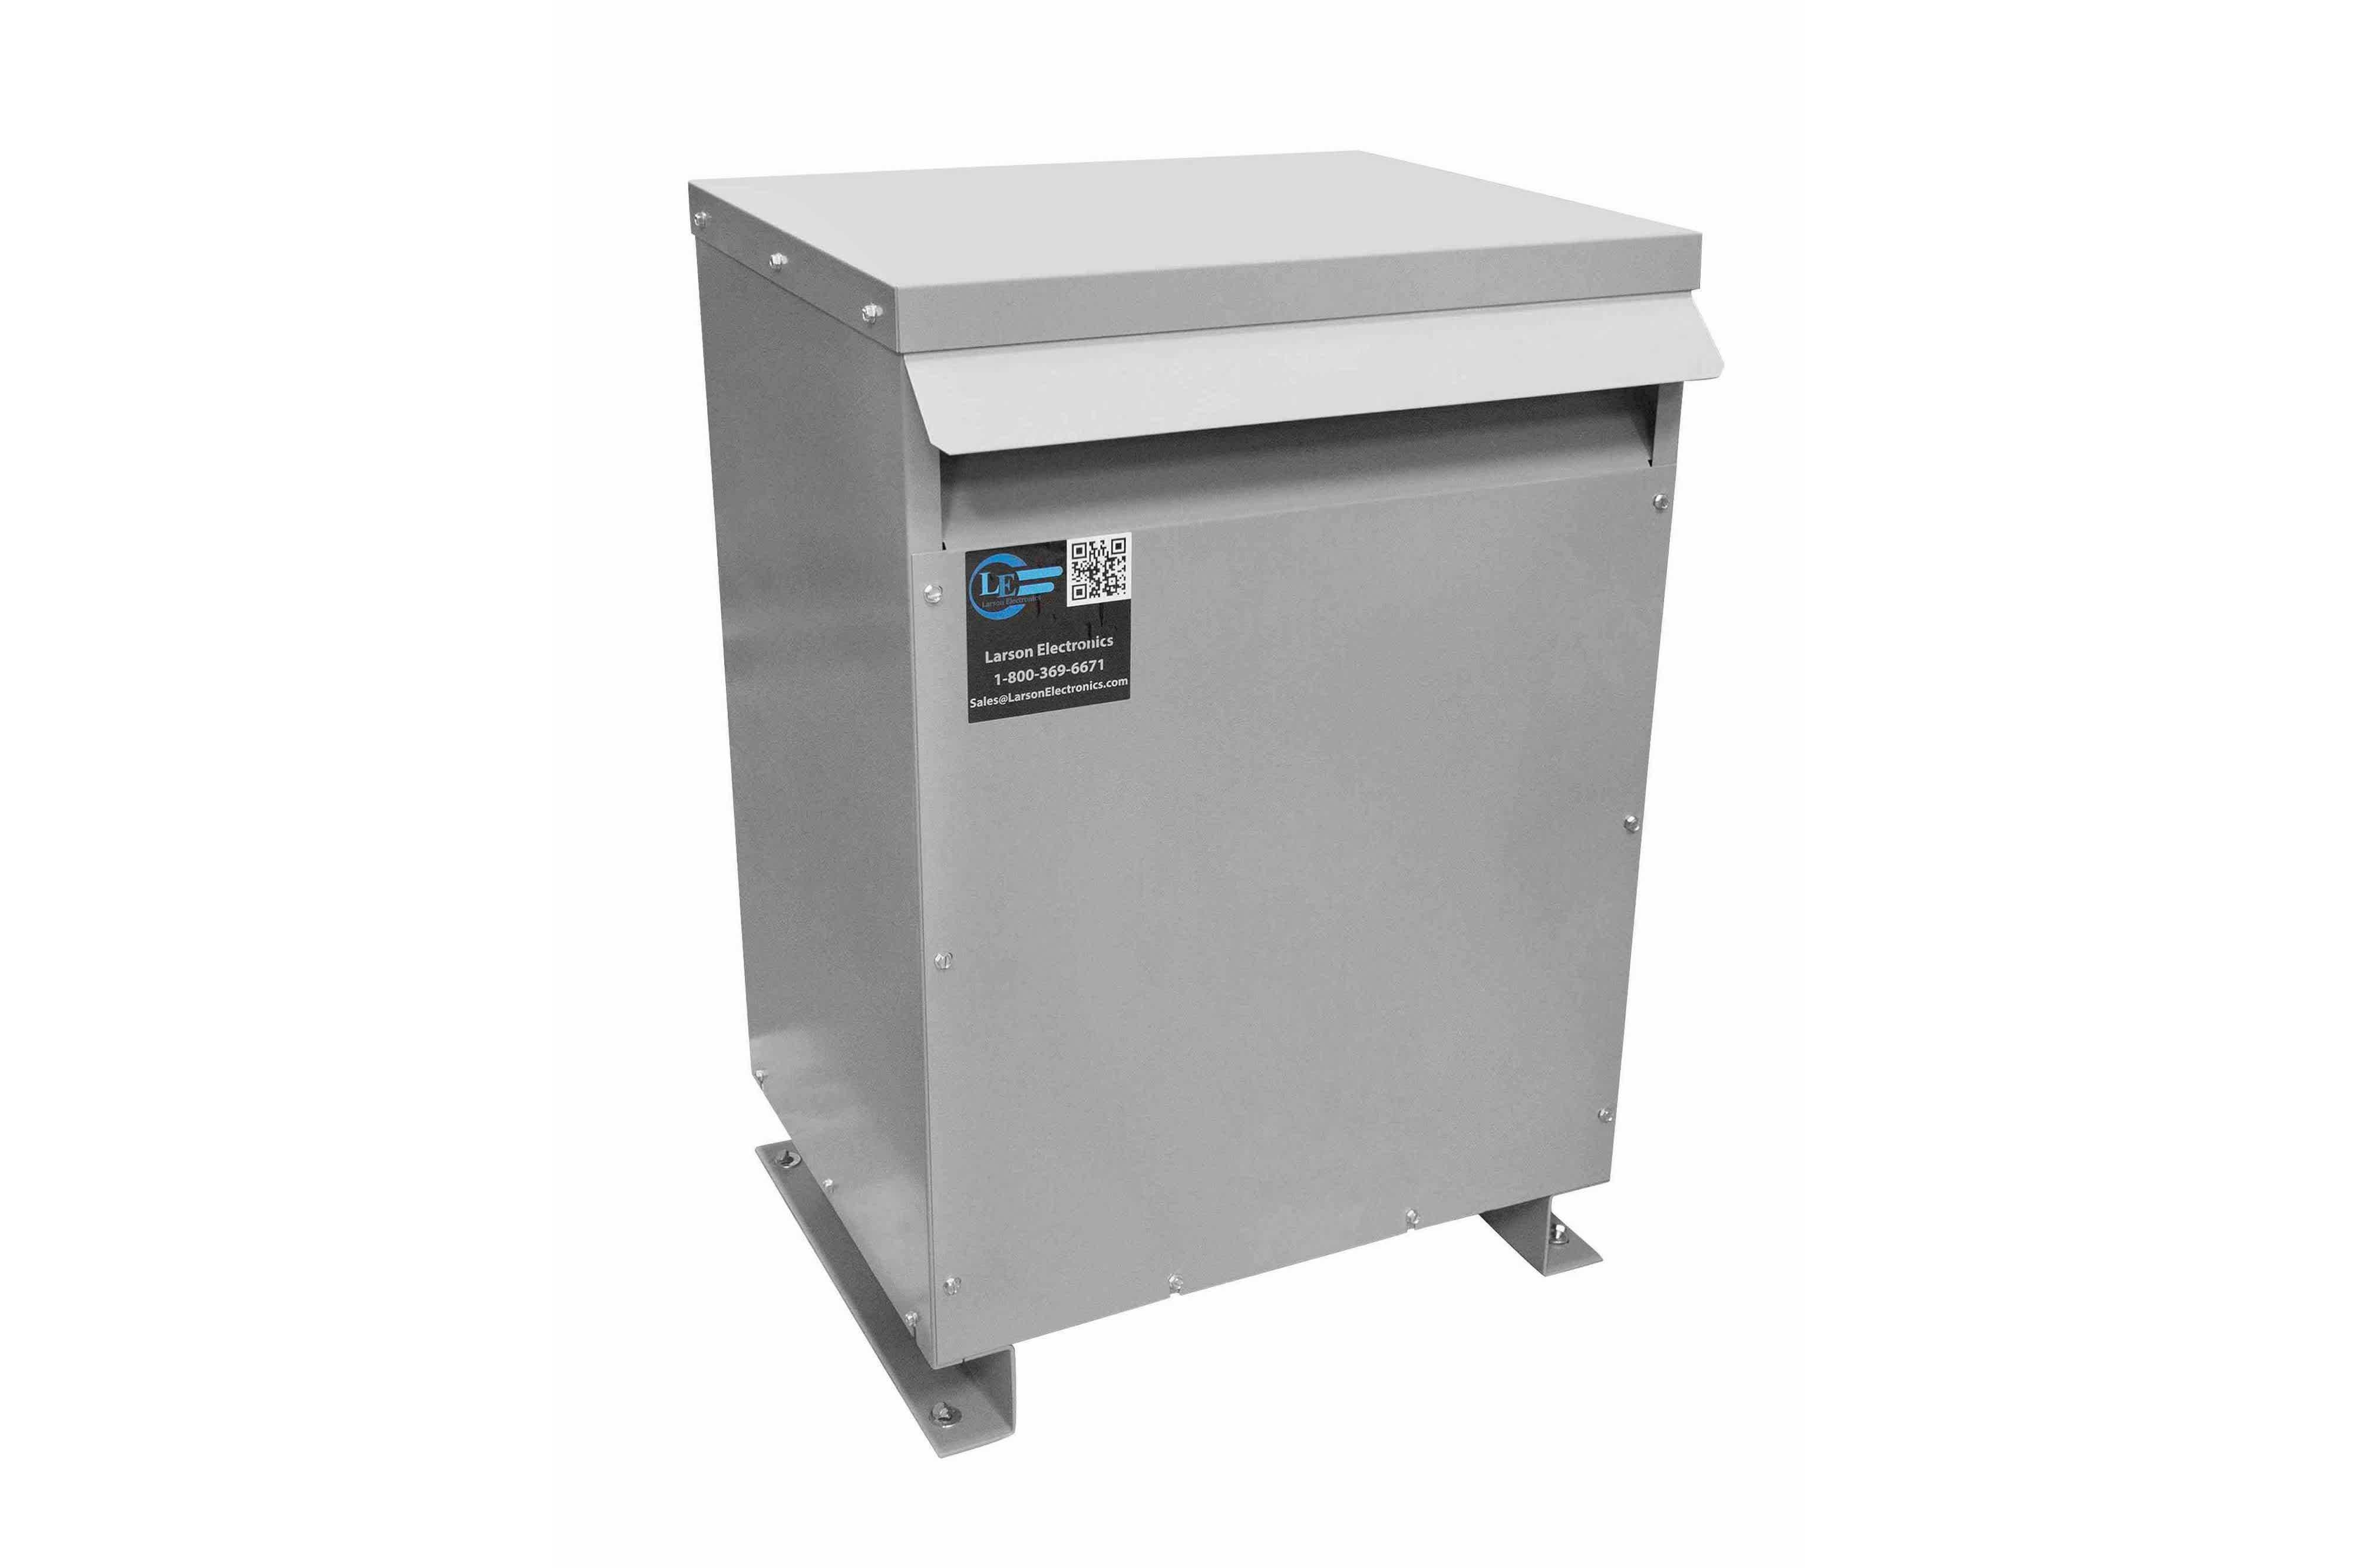 150 kVA 3PH DOE Transformer, 415V Delta Primary, 208Y/120 Wye-N Secondary, N3R, Ventilated, 60 Hz